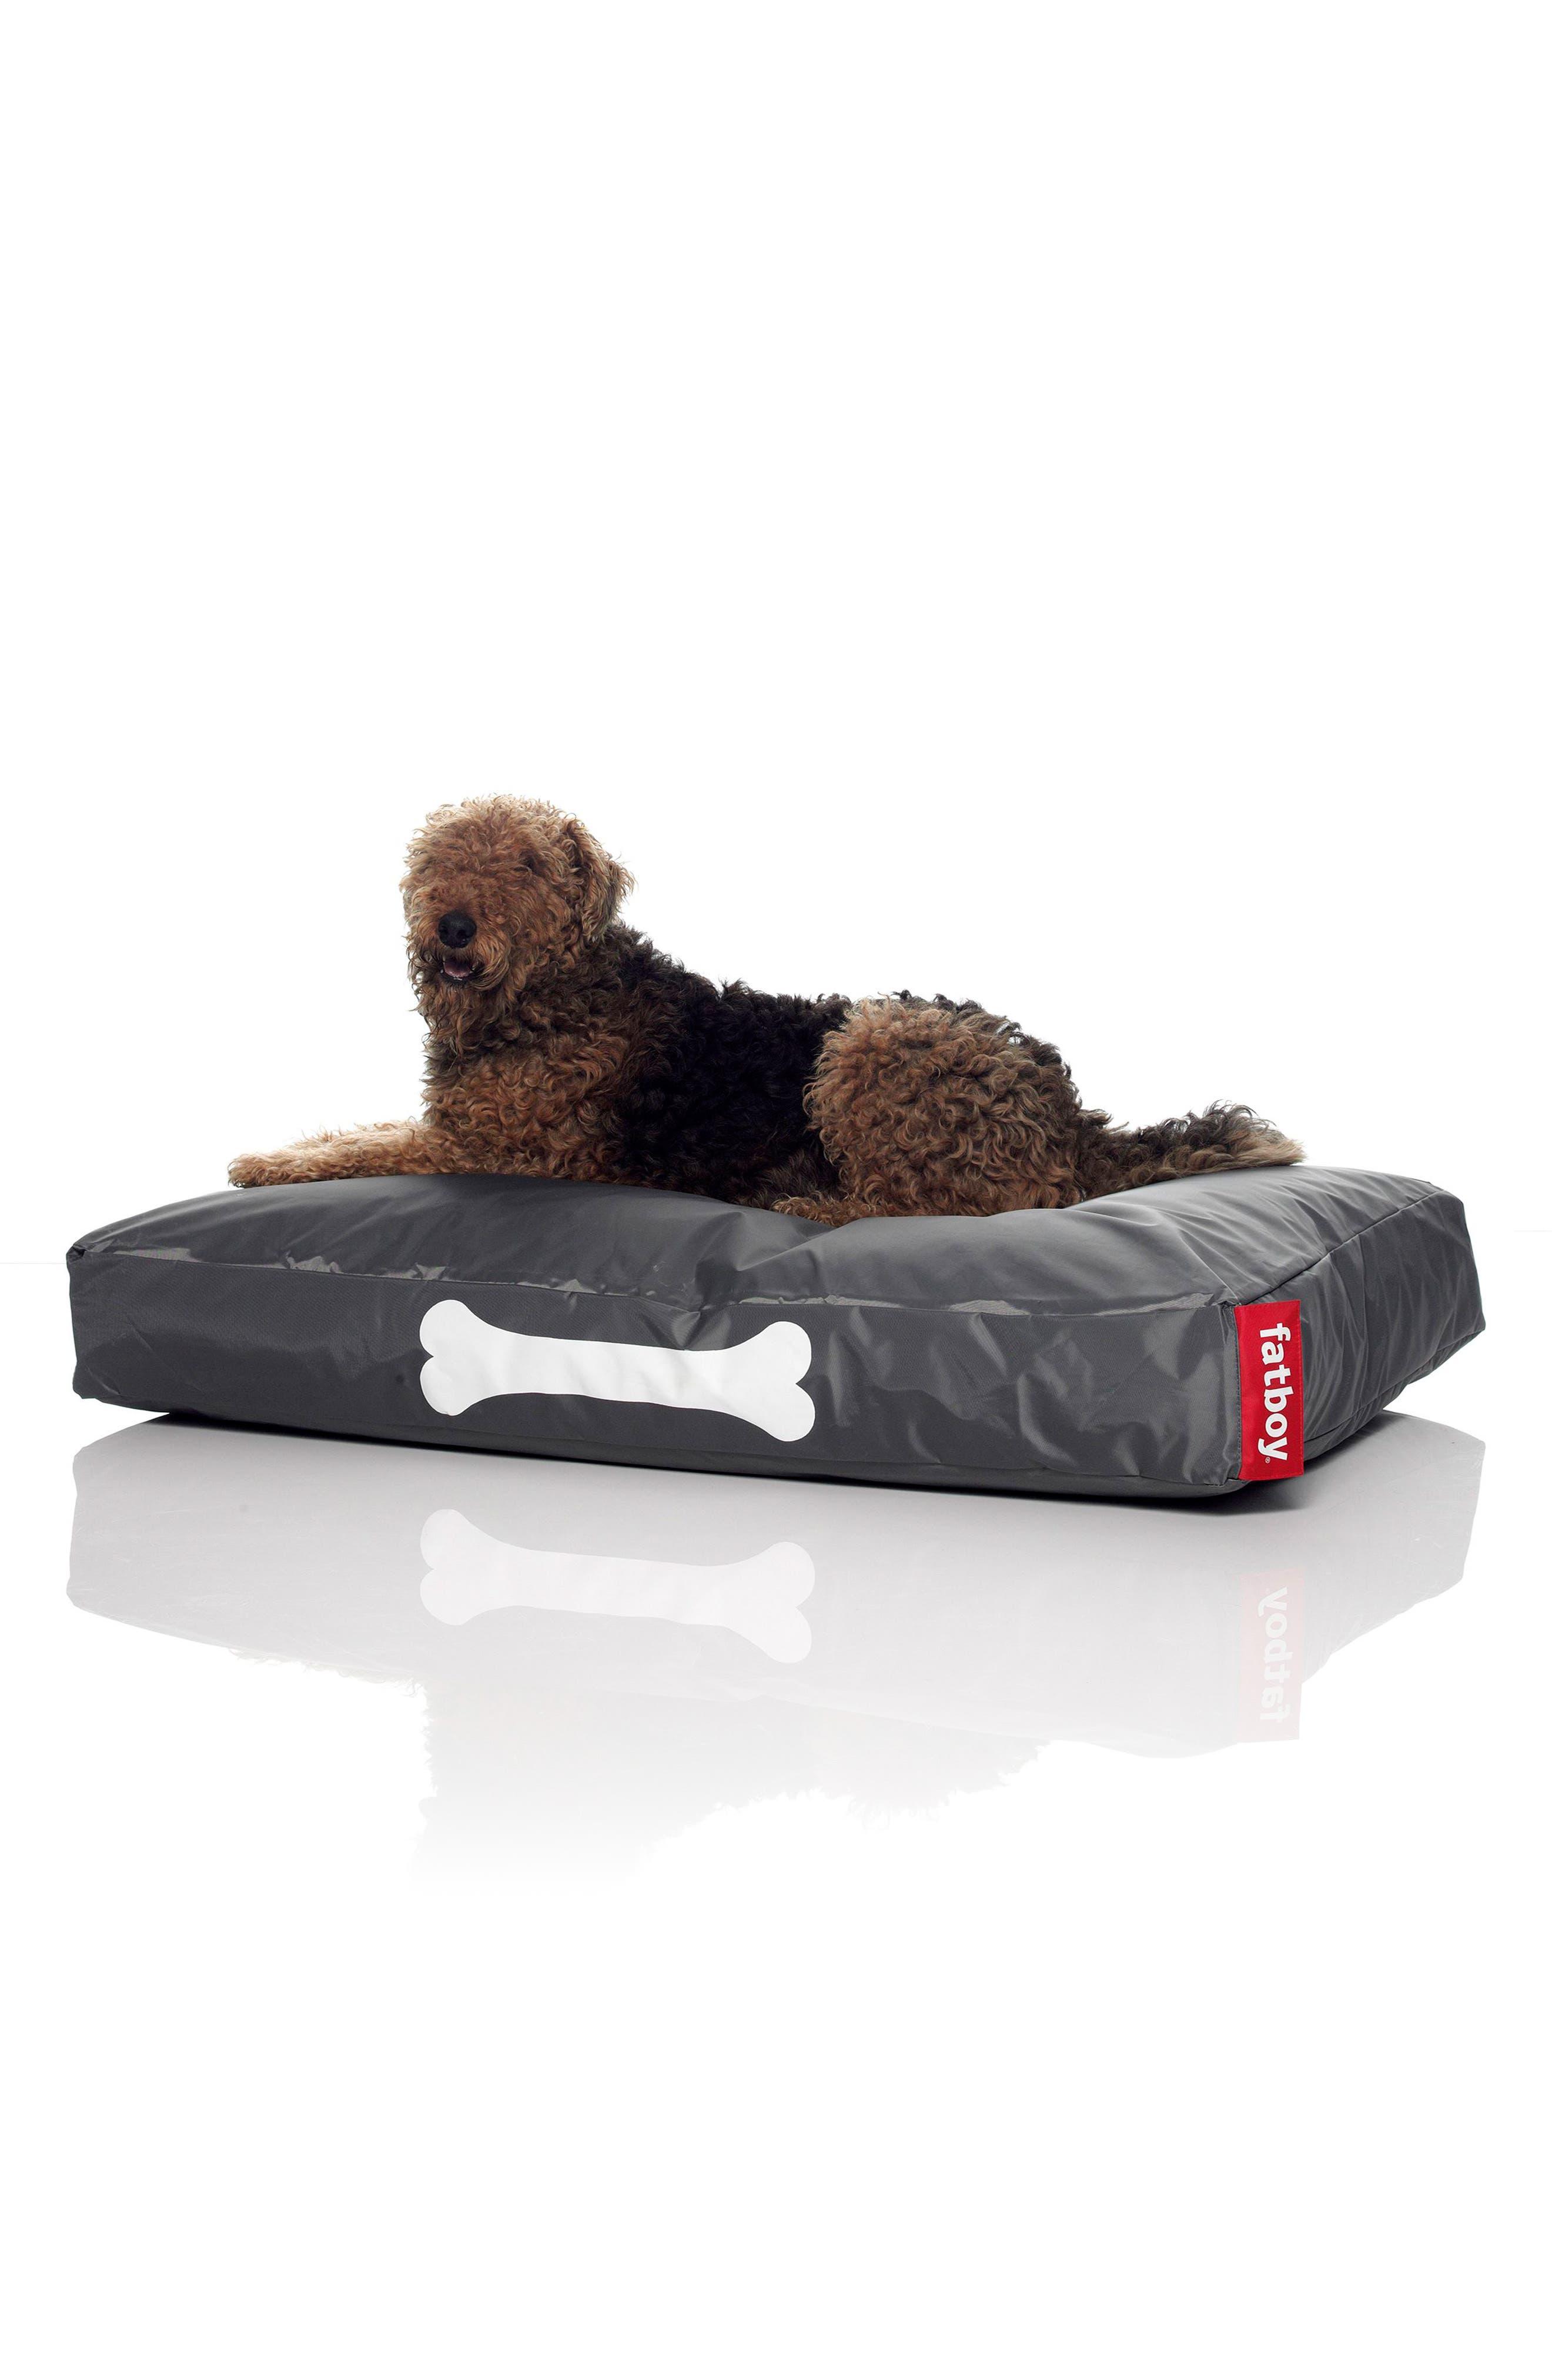 Alternate Image 2  - Fatboy Doggielounge Pet Bed